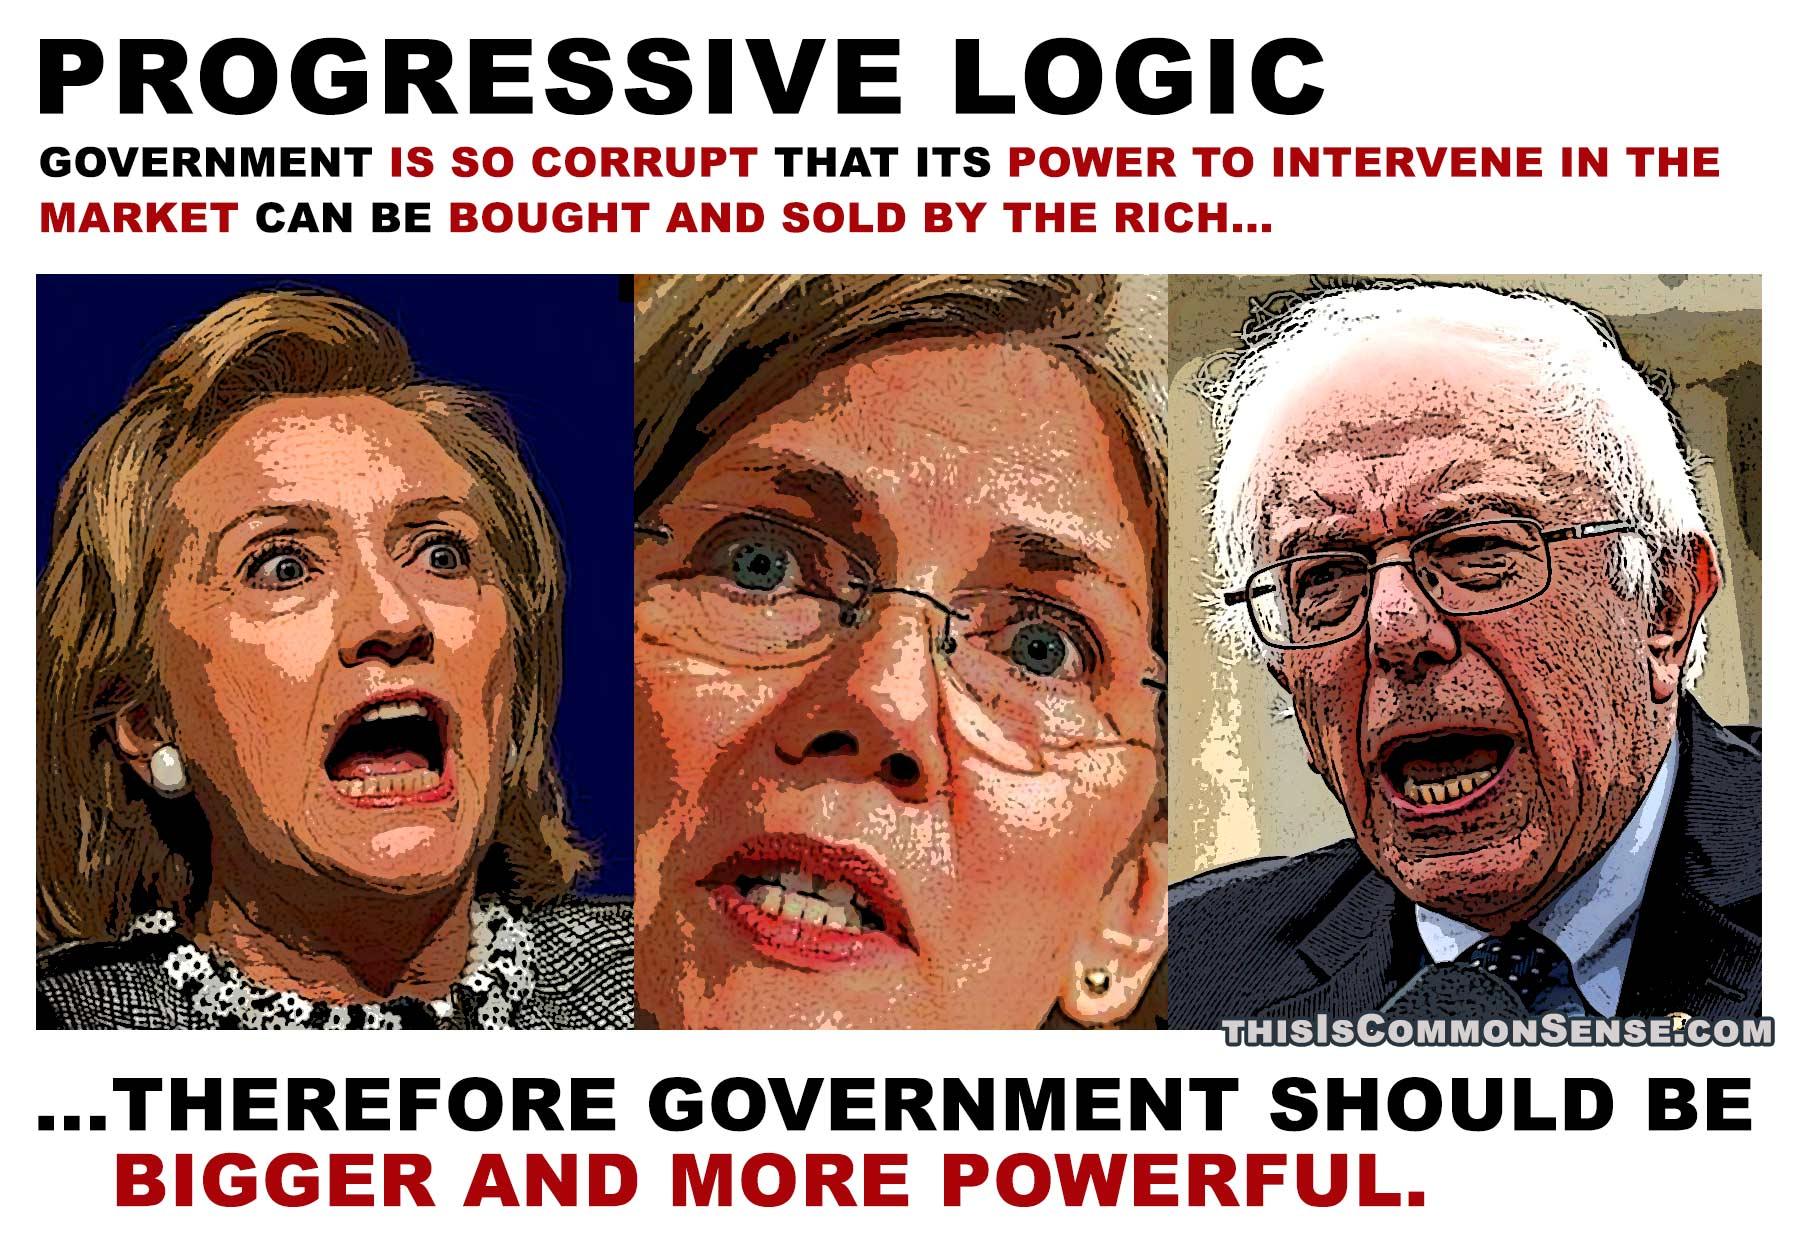 progressive logic, crony capitalism, corruption, big government, government power, meme, illustration, photomontage, Jim Gill, Paul Jacob, Common Sense